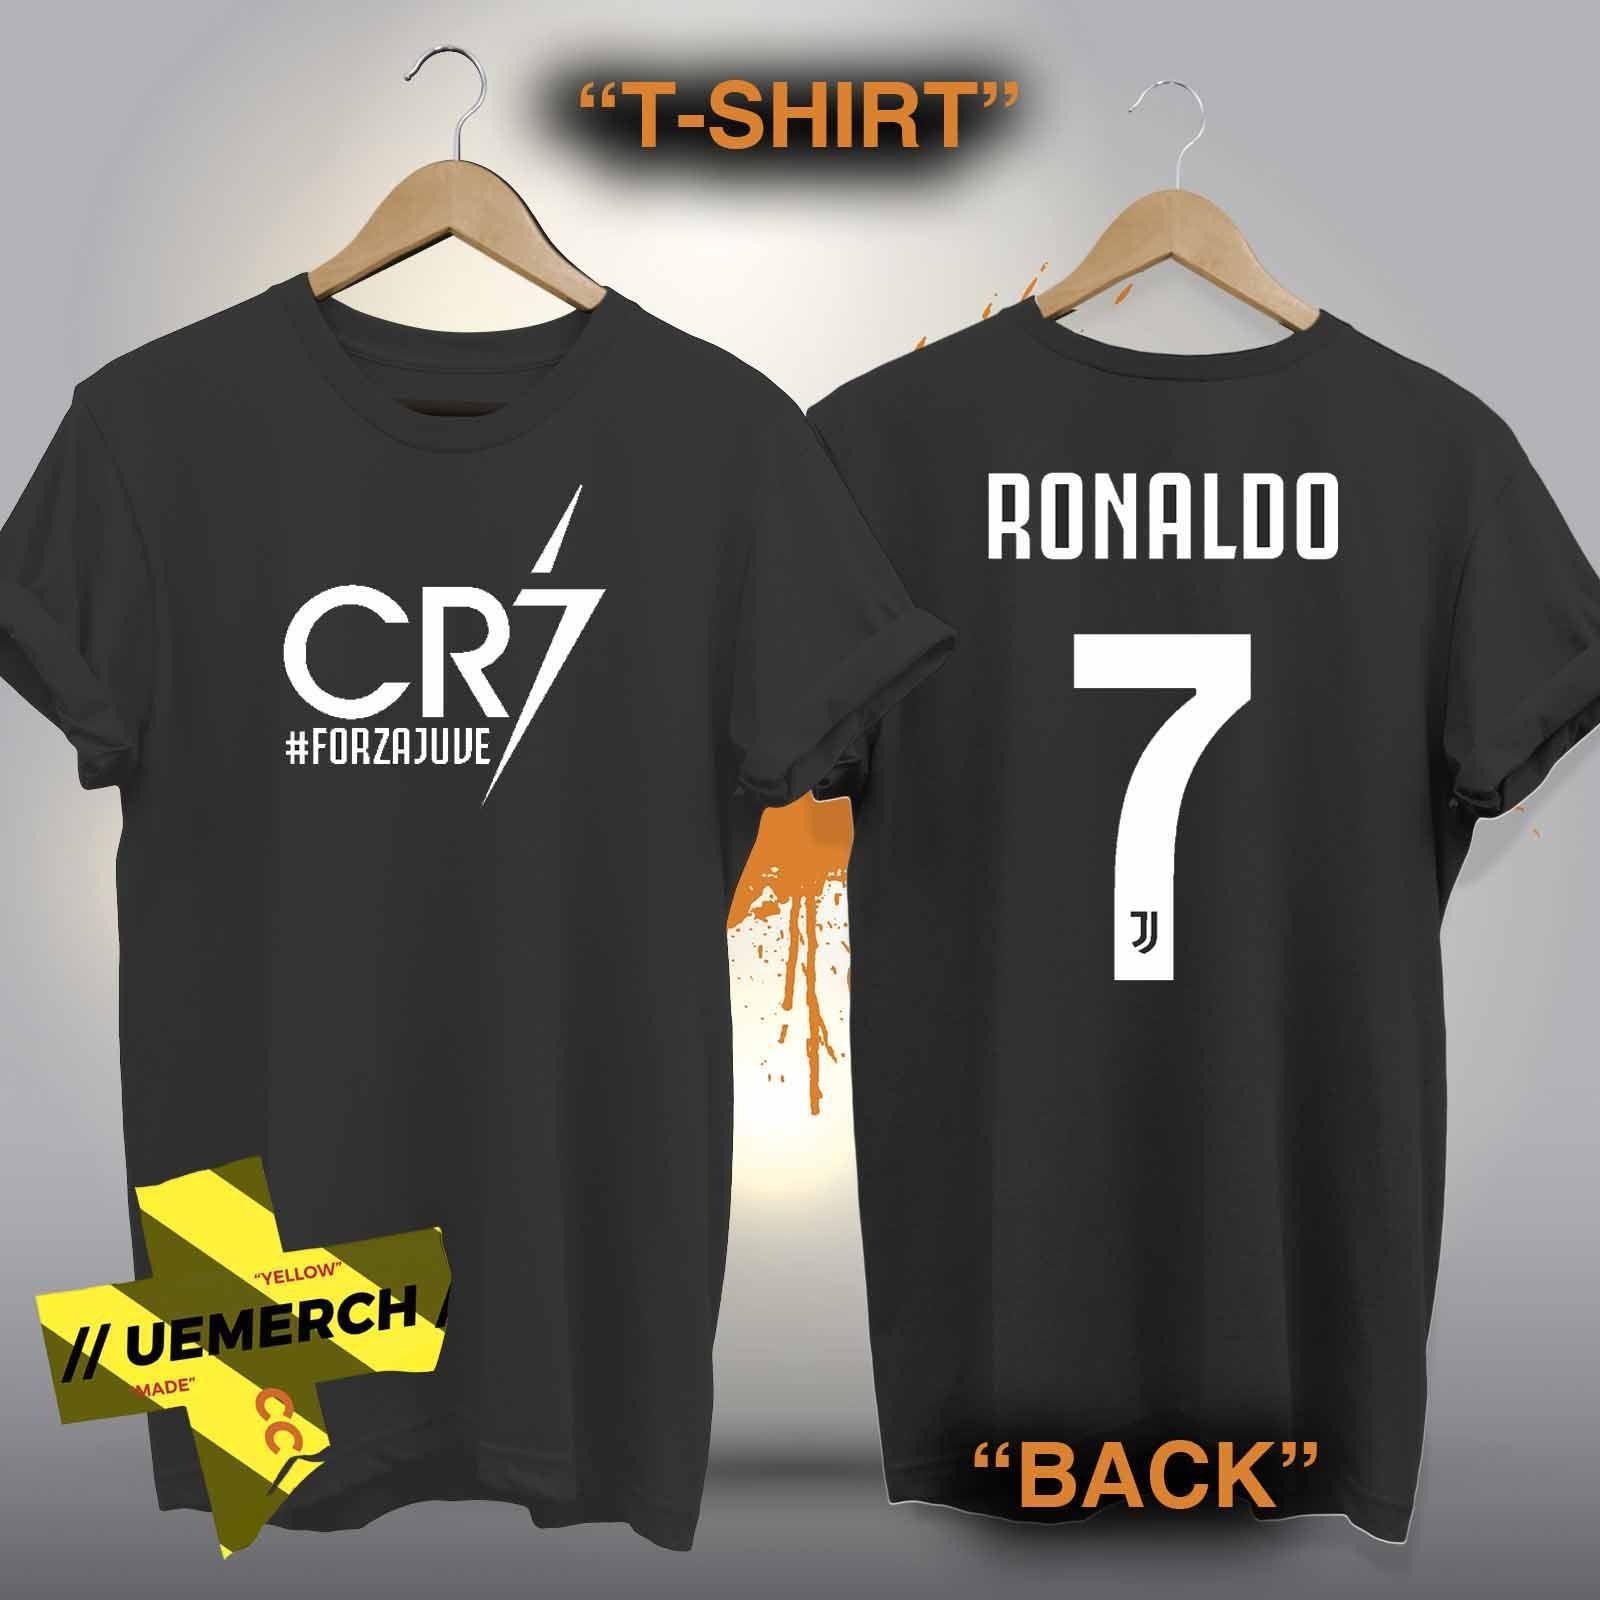 T-shirts Shop For Cheap Cr7 T-shirt Cristiano Ronaldo Portugal Cool Casual Pride T Shirt Men Unisex Fashion Tshirt Free Shipping Funny Tops Men's Clothing